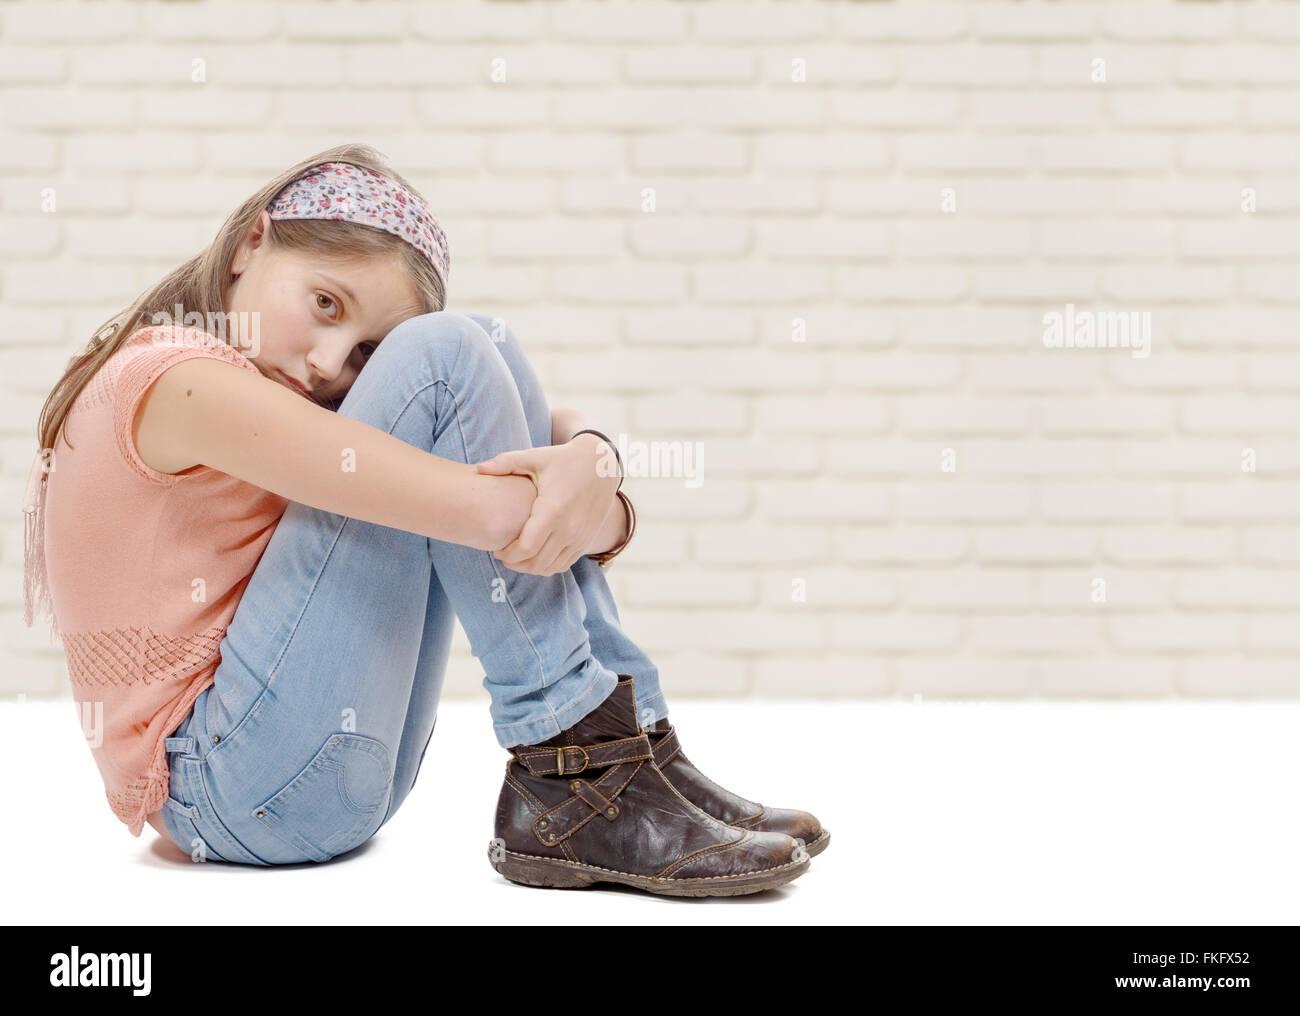 a pre-teen girl sad n is sitting on the floor - Stock Image